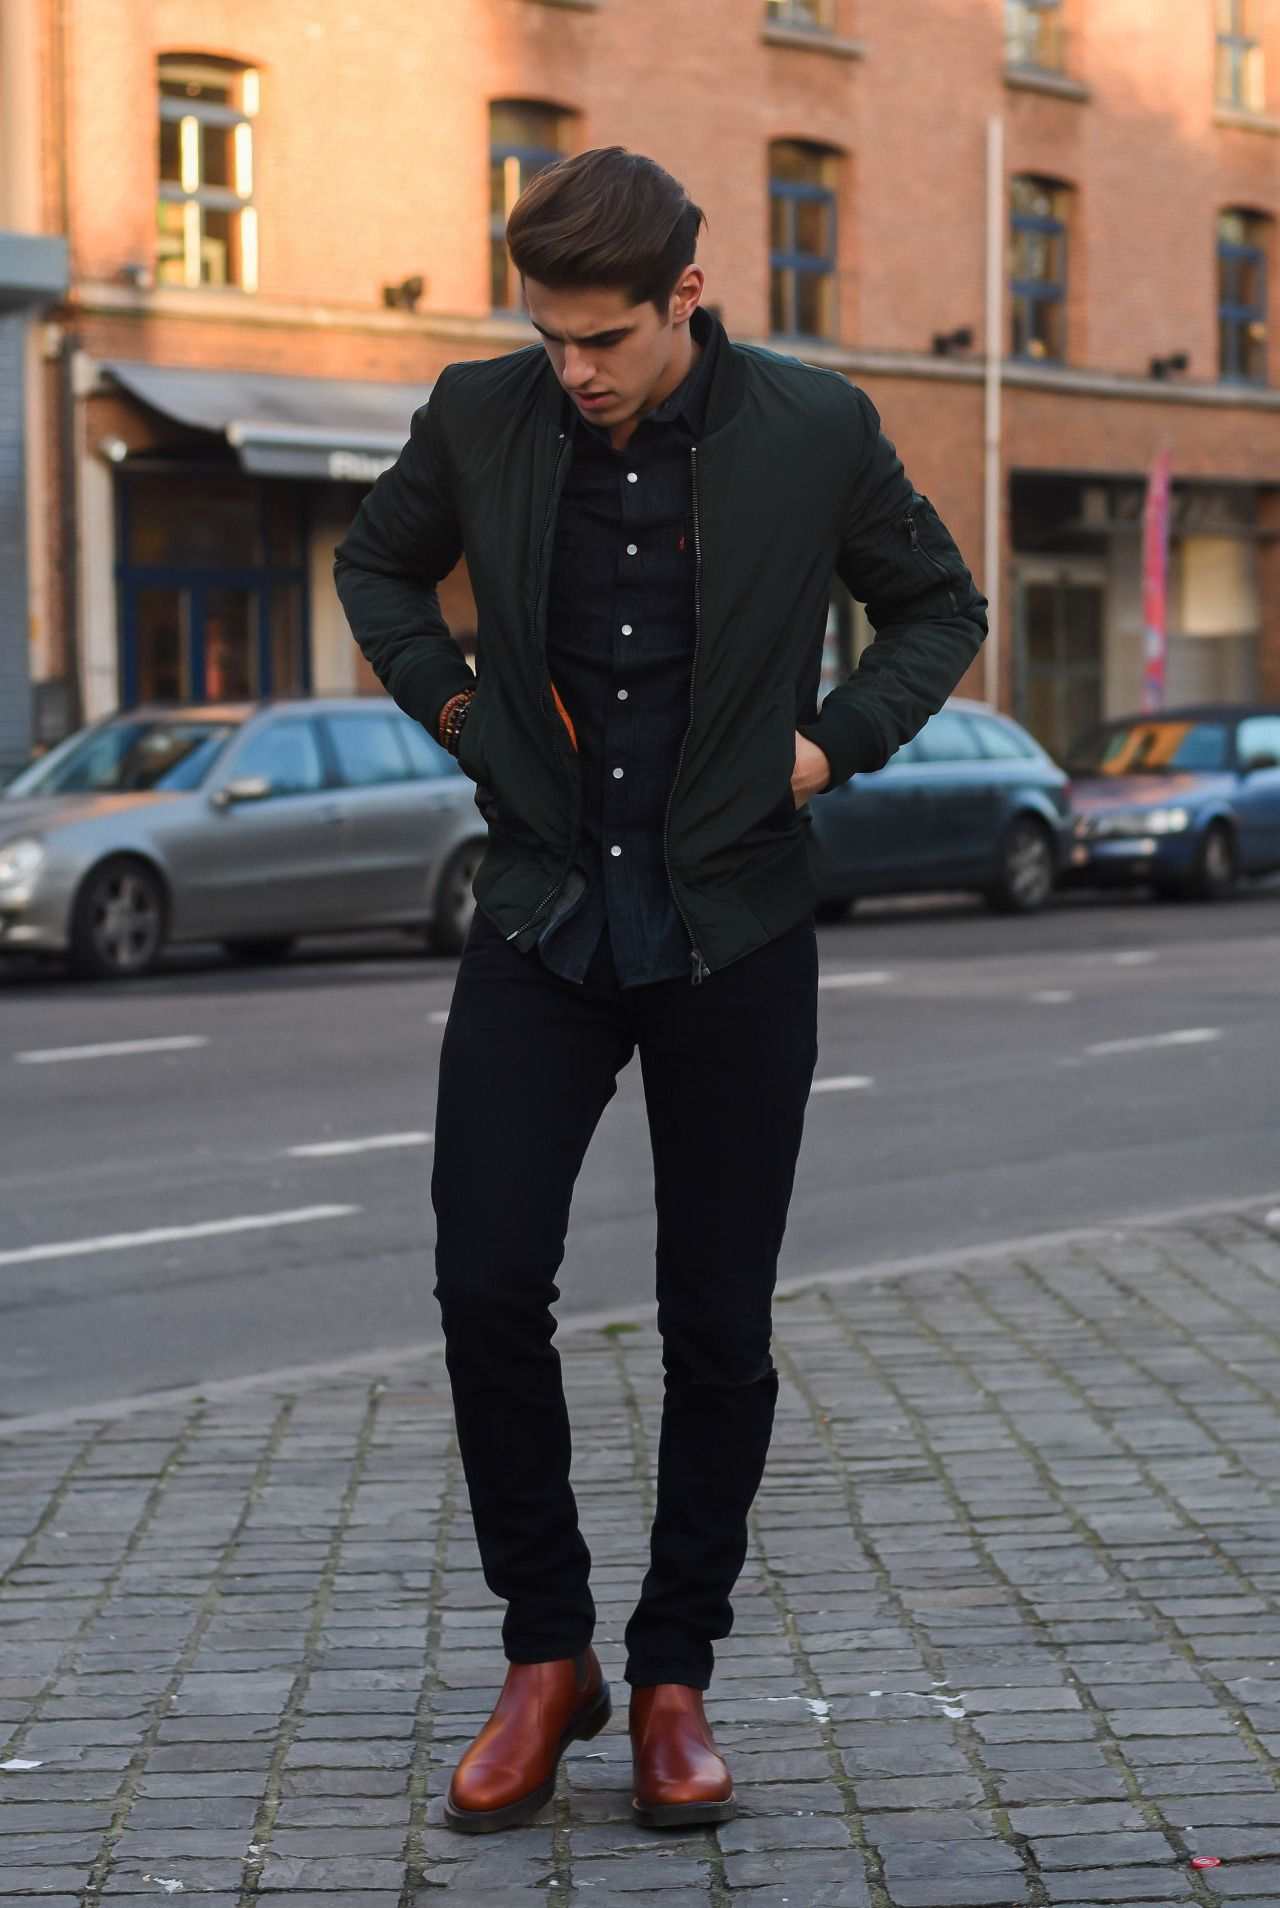 3e1bb0a25 urban // boots, black denim, bomber jacket, button down, menswear ...